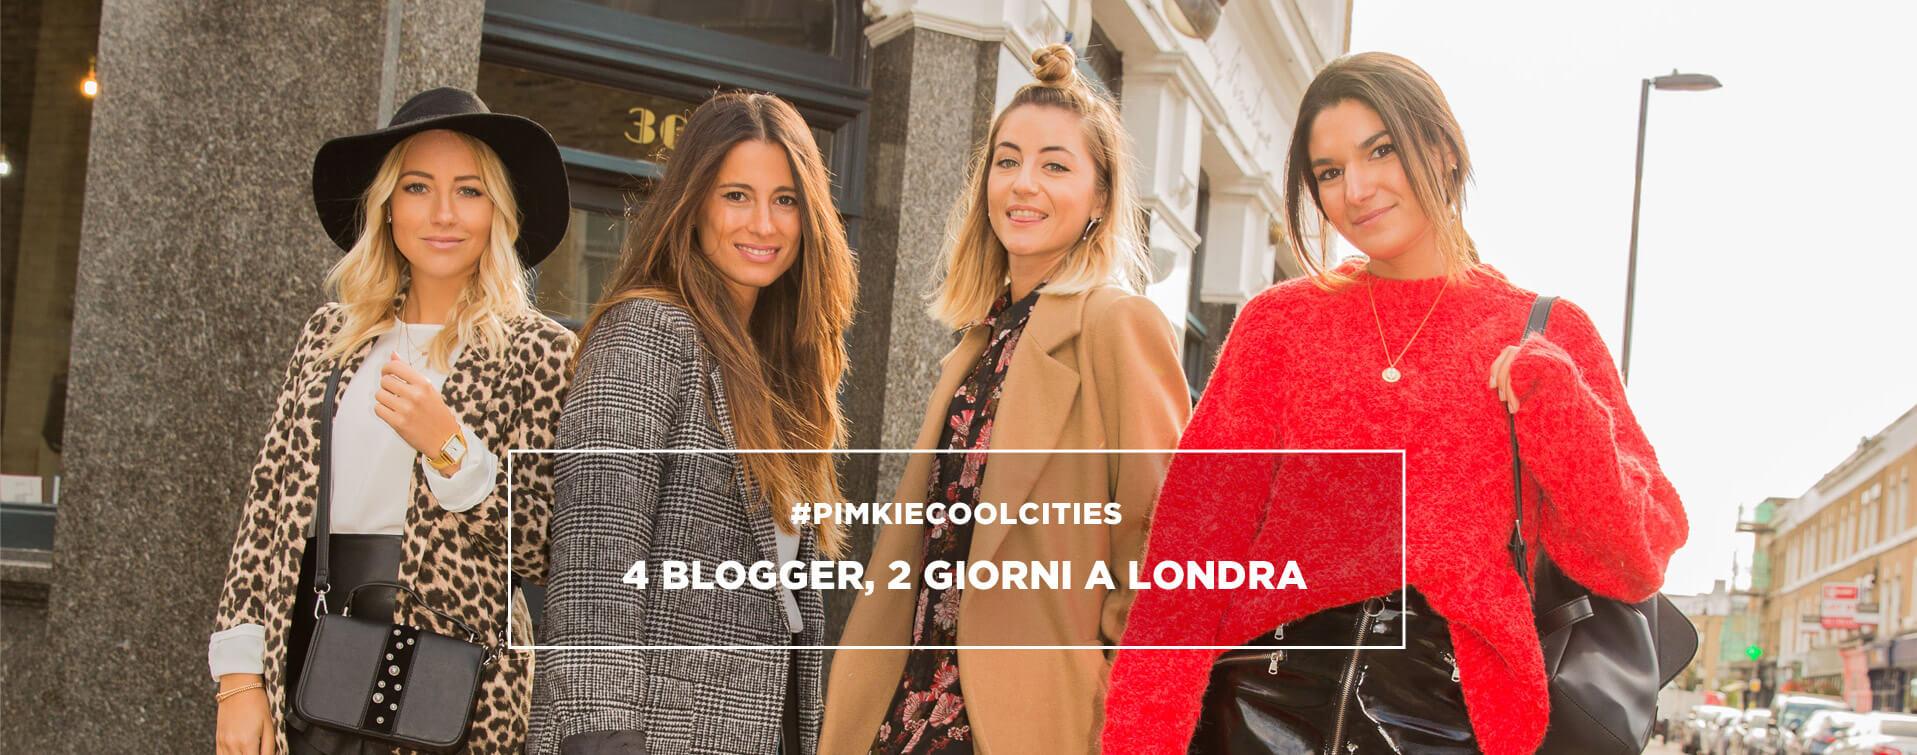 PIMKIE Coolcities London